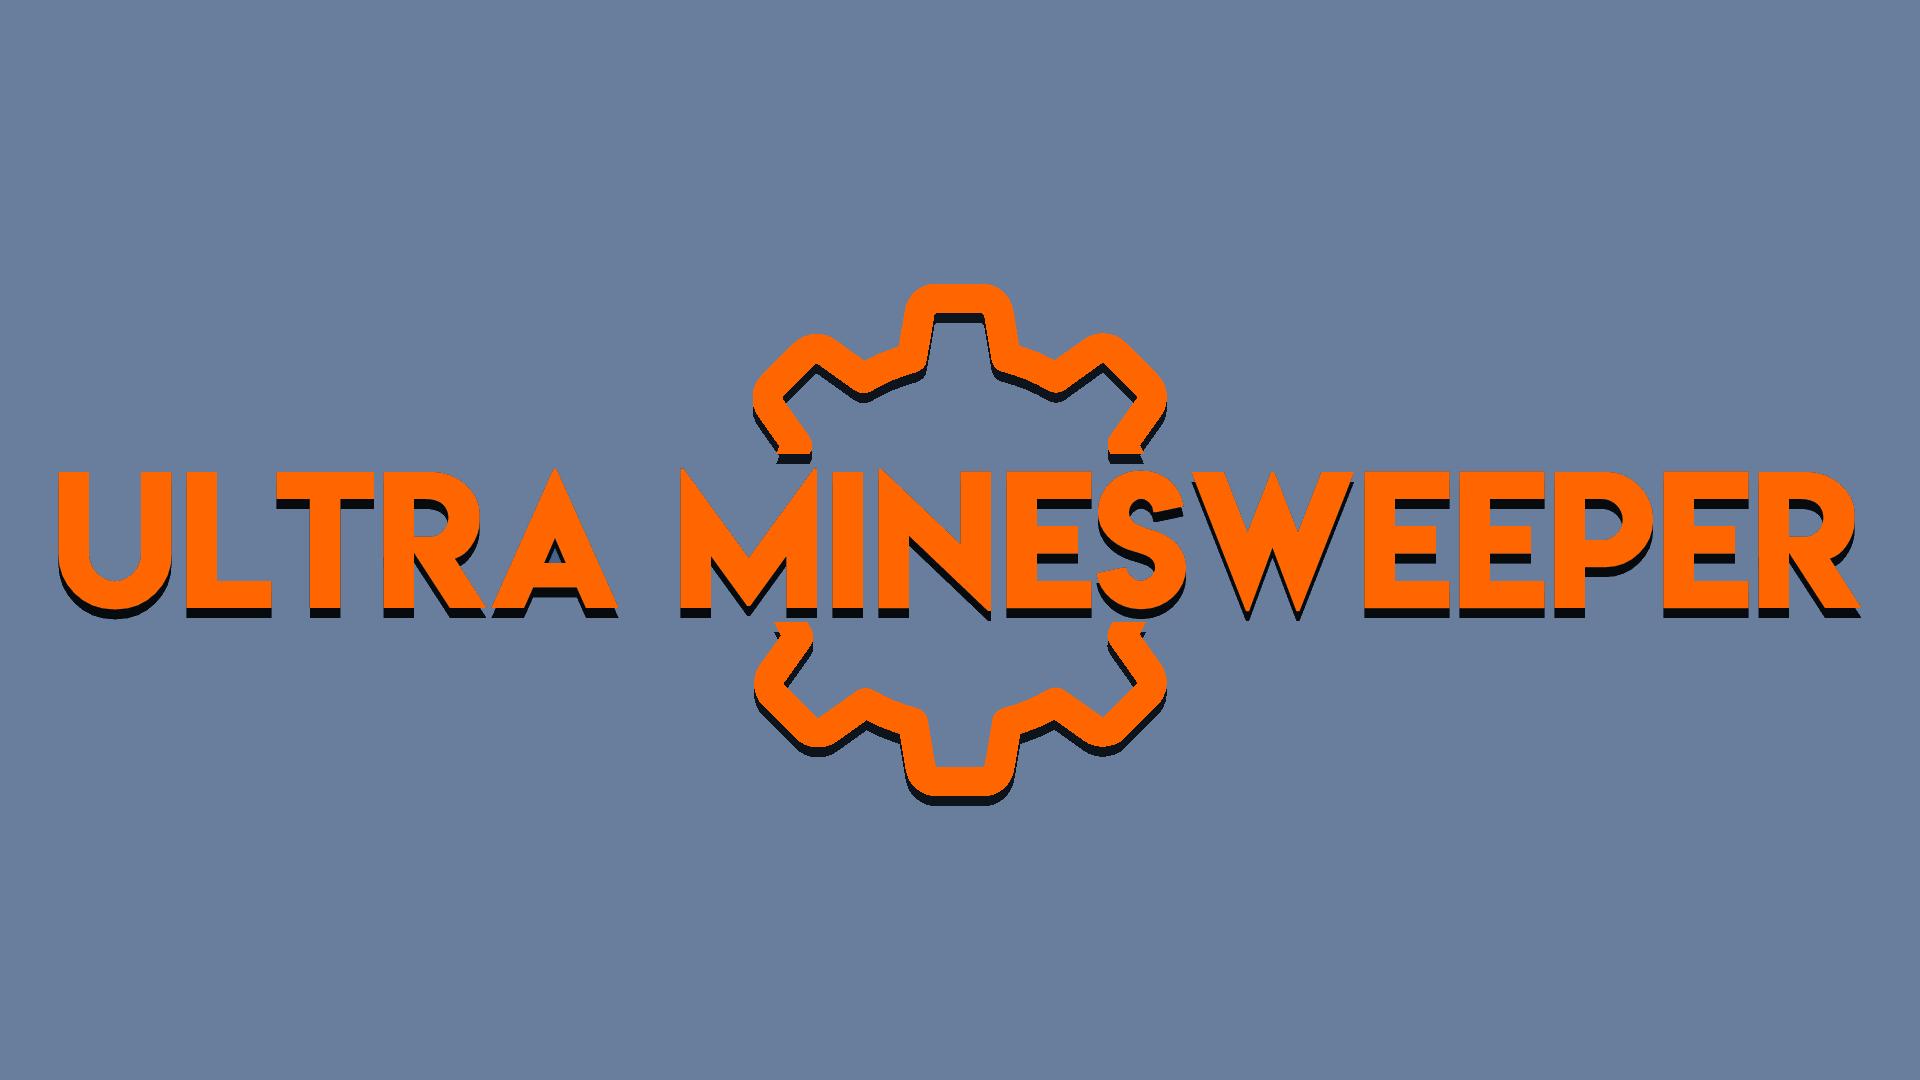 Ultra Minesweeper